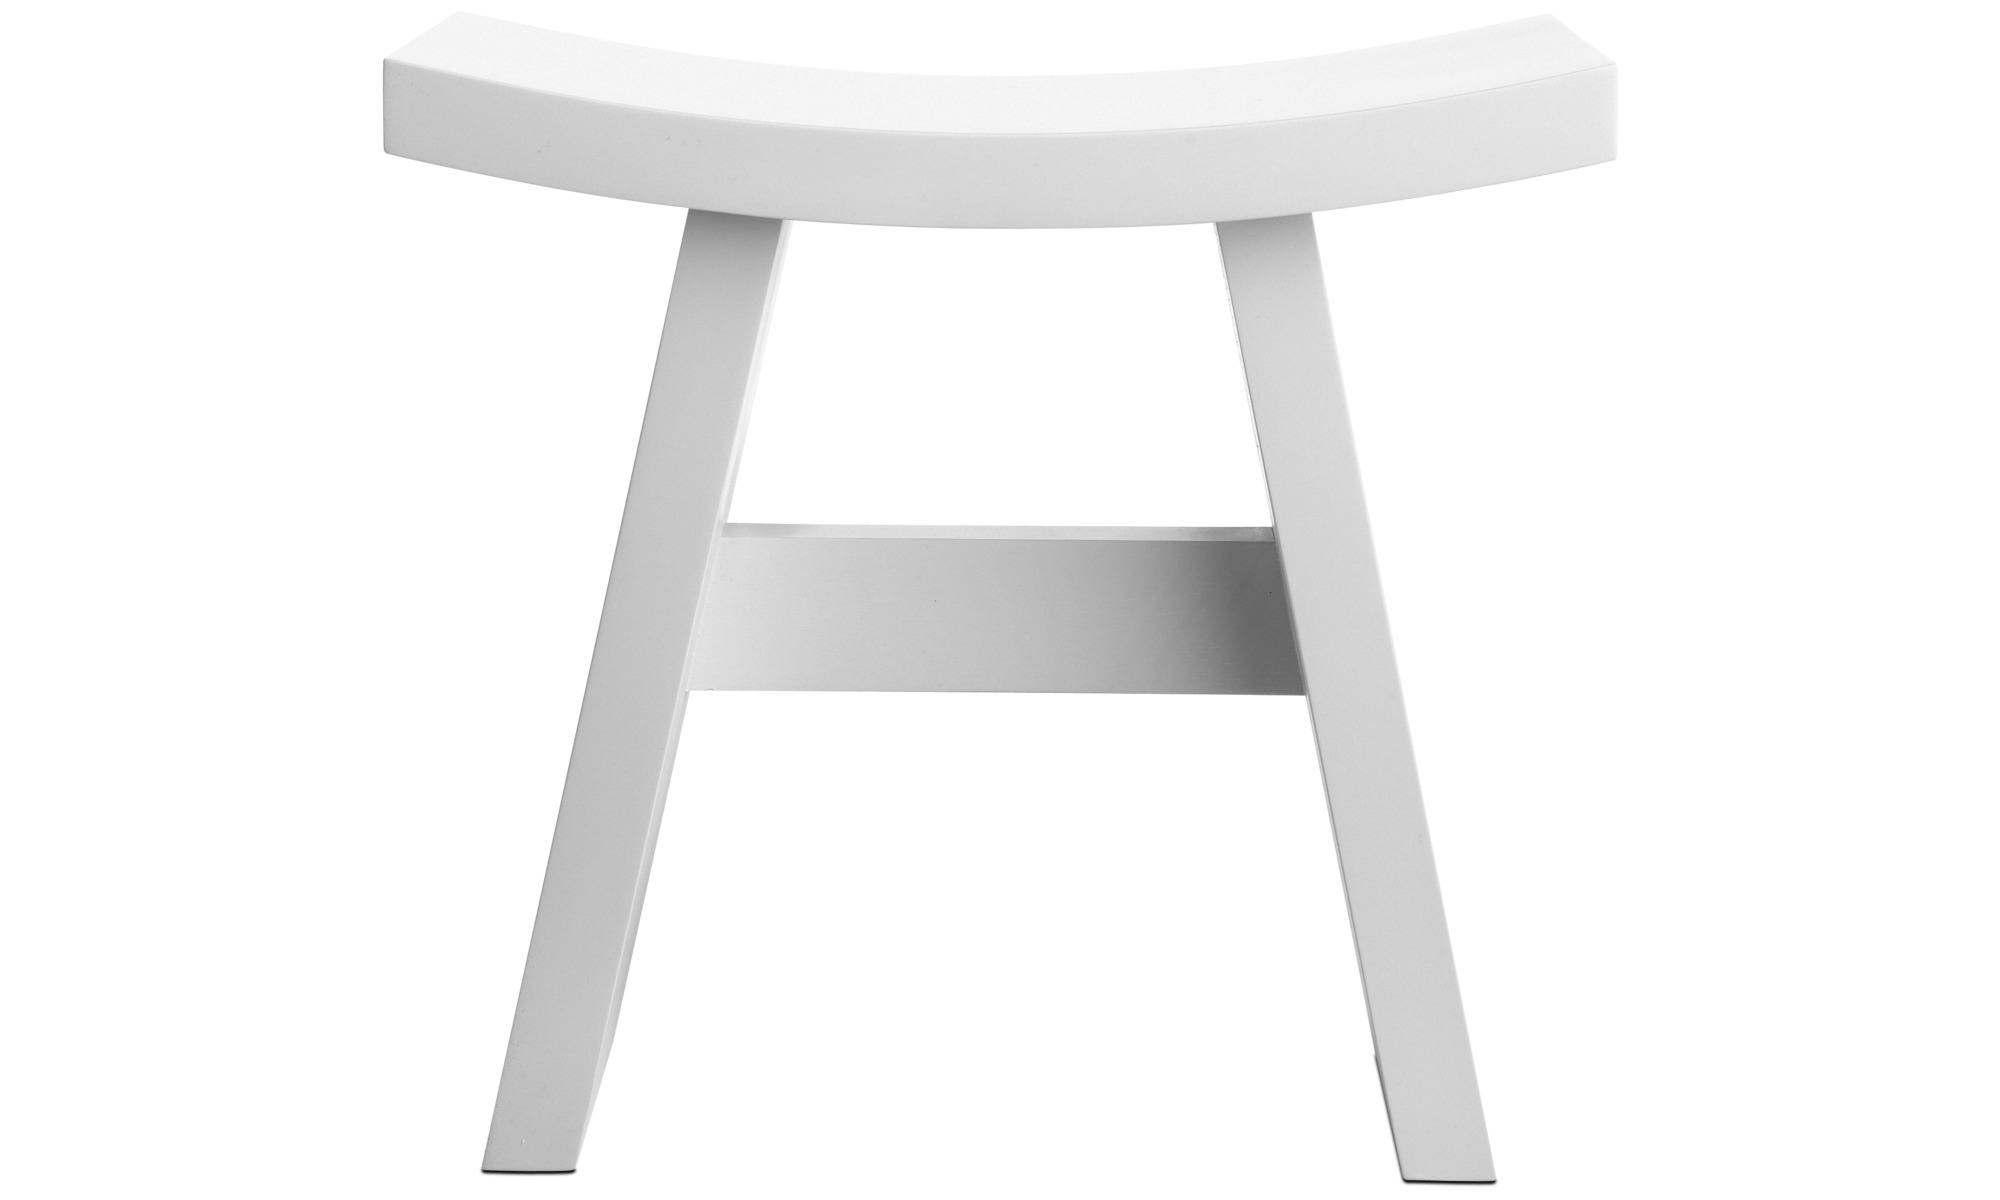 stools shogun stool boconcept. Black Bedroom Furniture Sets. Home Design Ideas